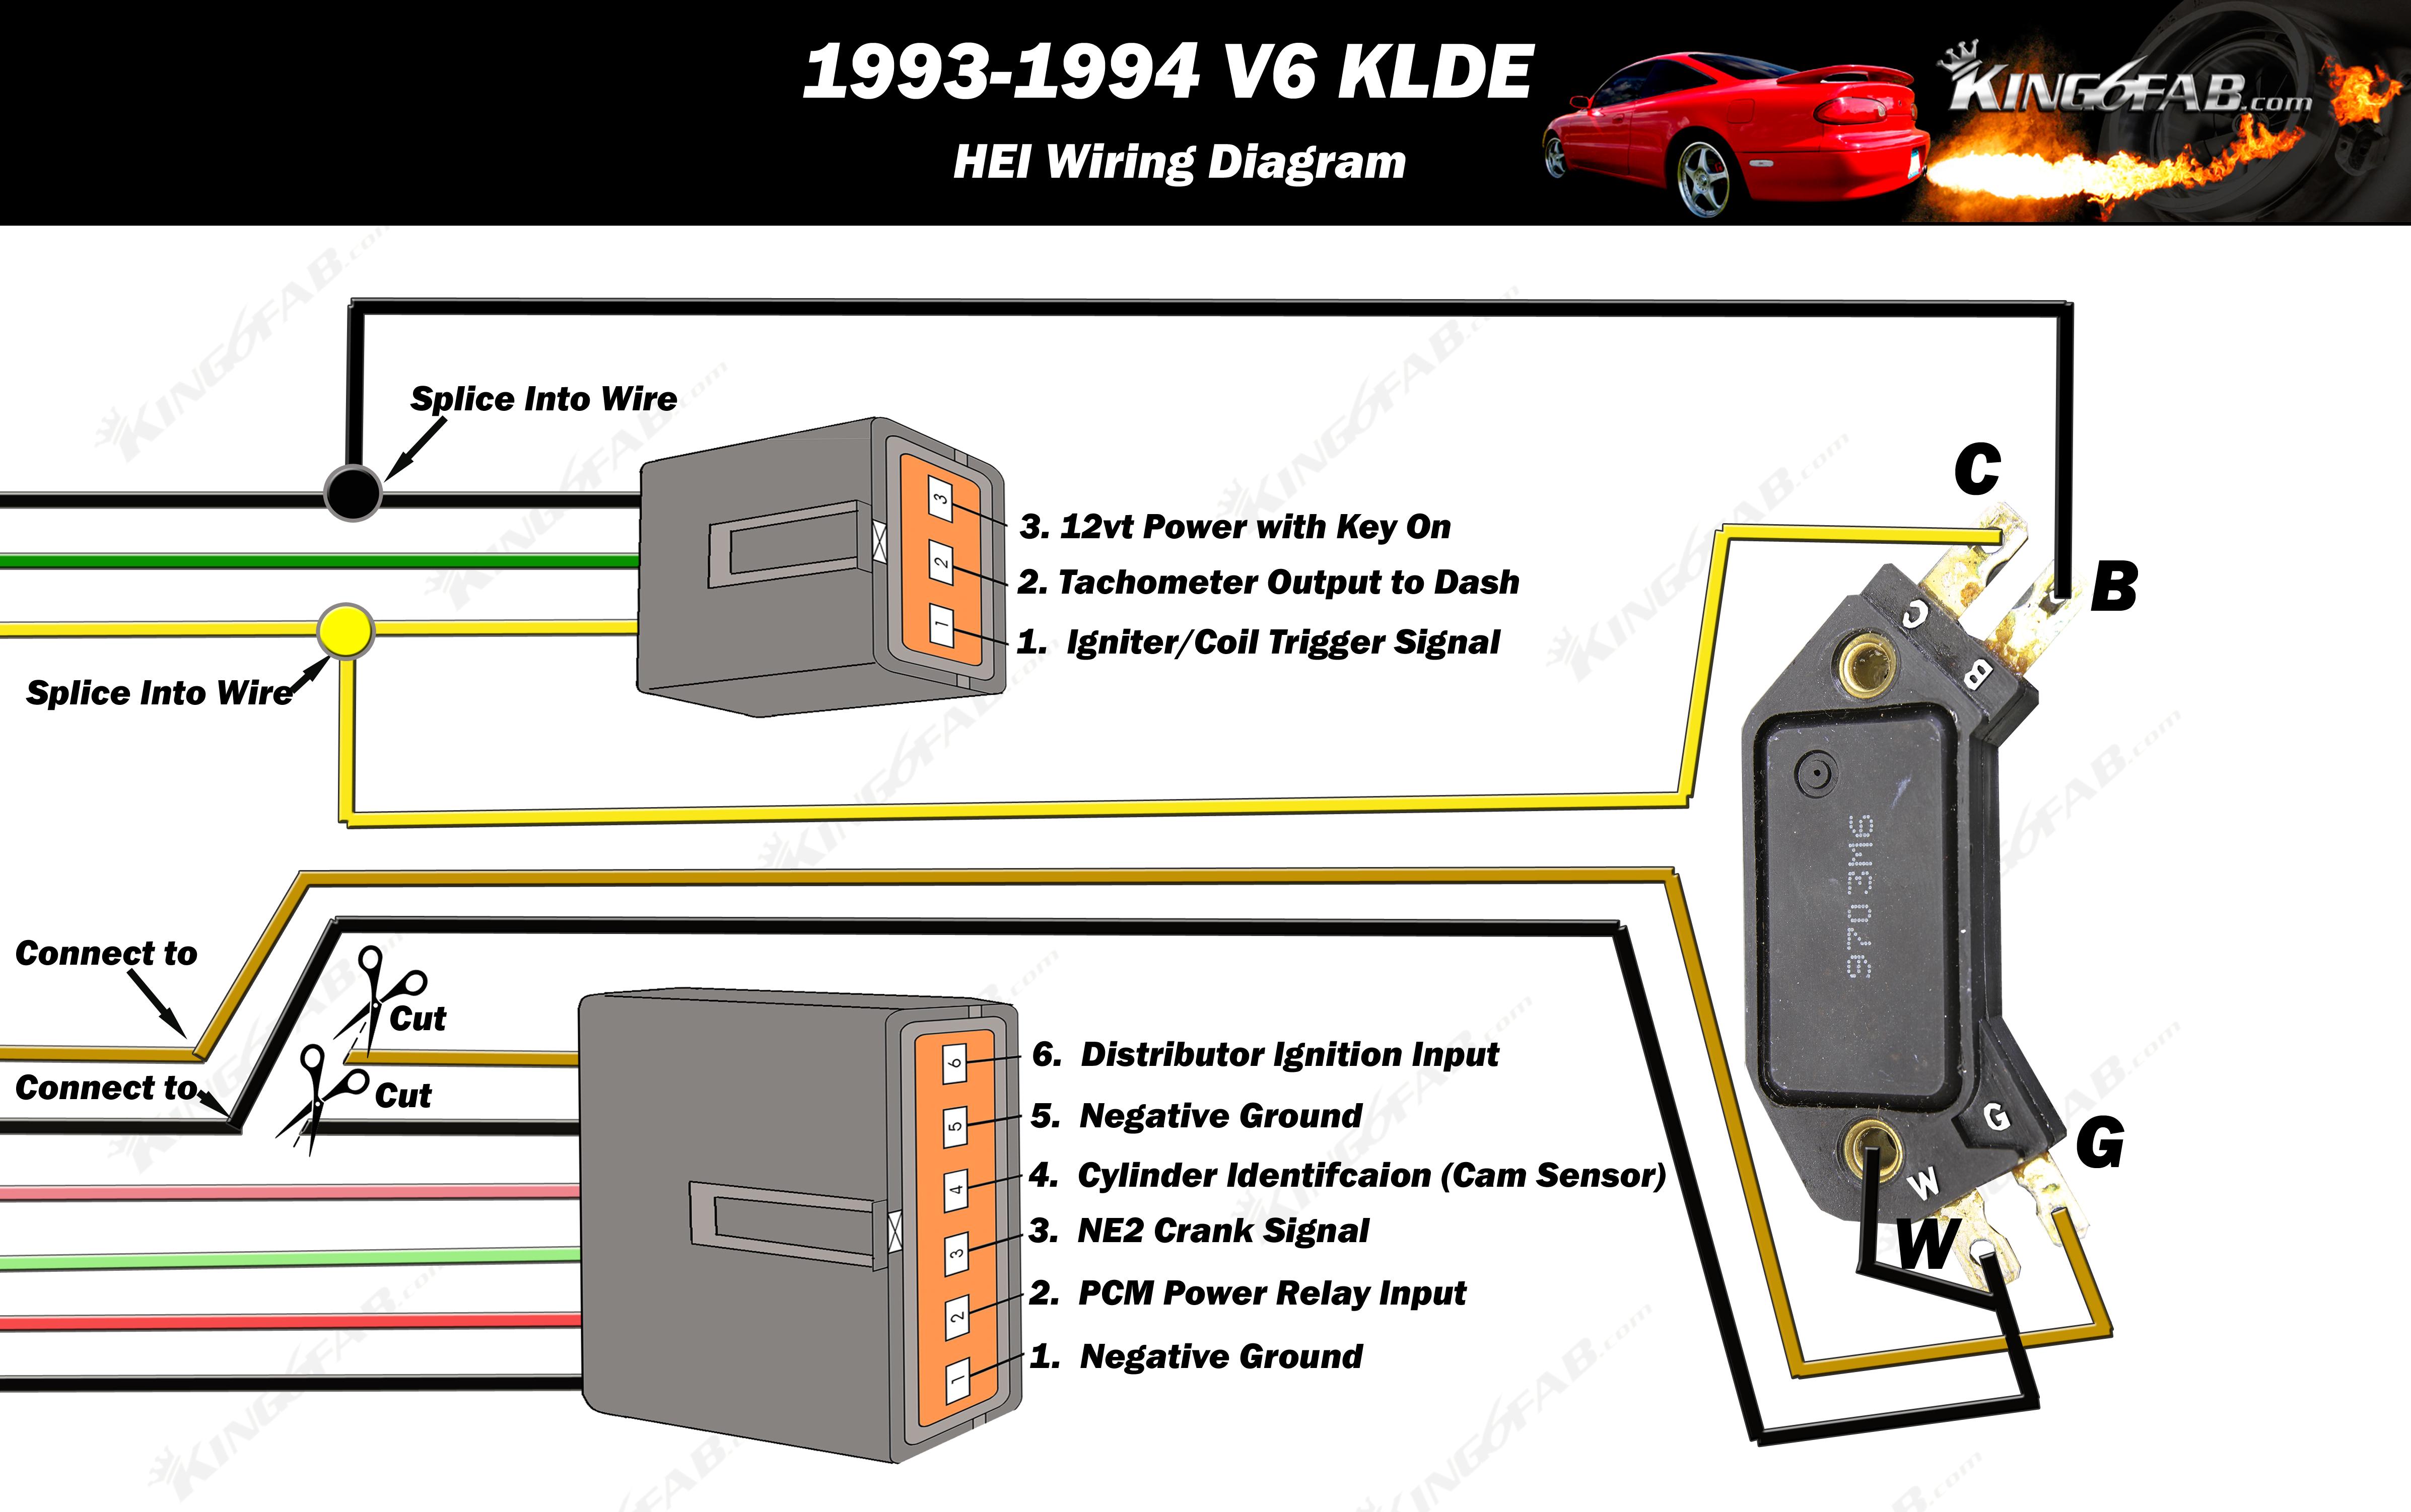 1997 mazda mx6 wiring schematic hei wiring diagrams     welcome to king6fab  hei wiring diagrams     welcome to king6fab